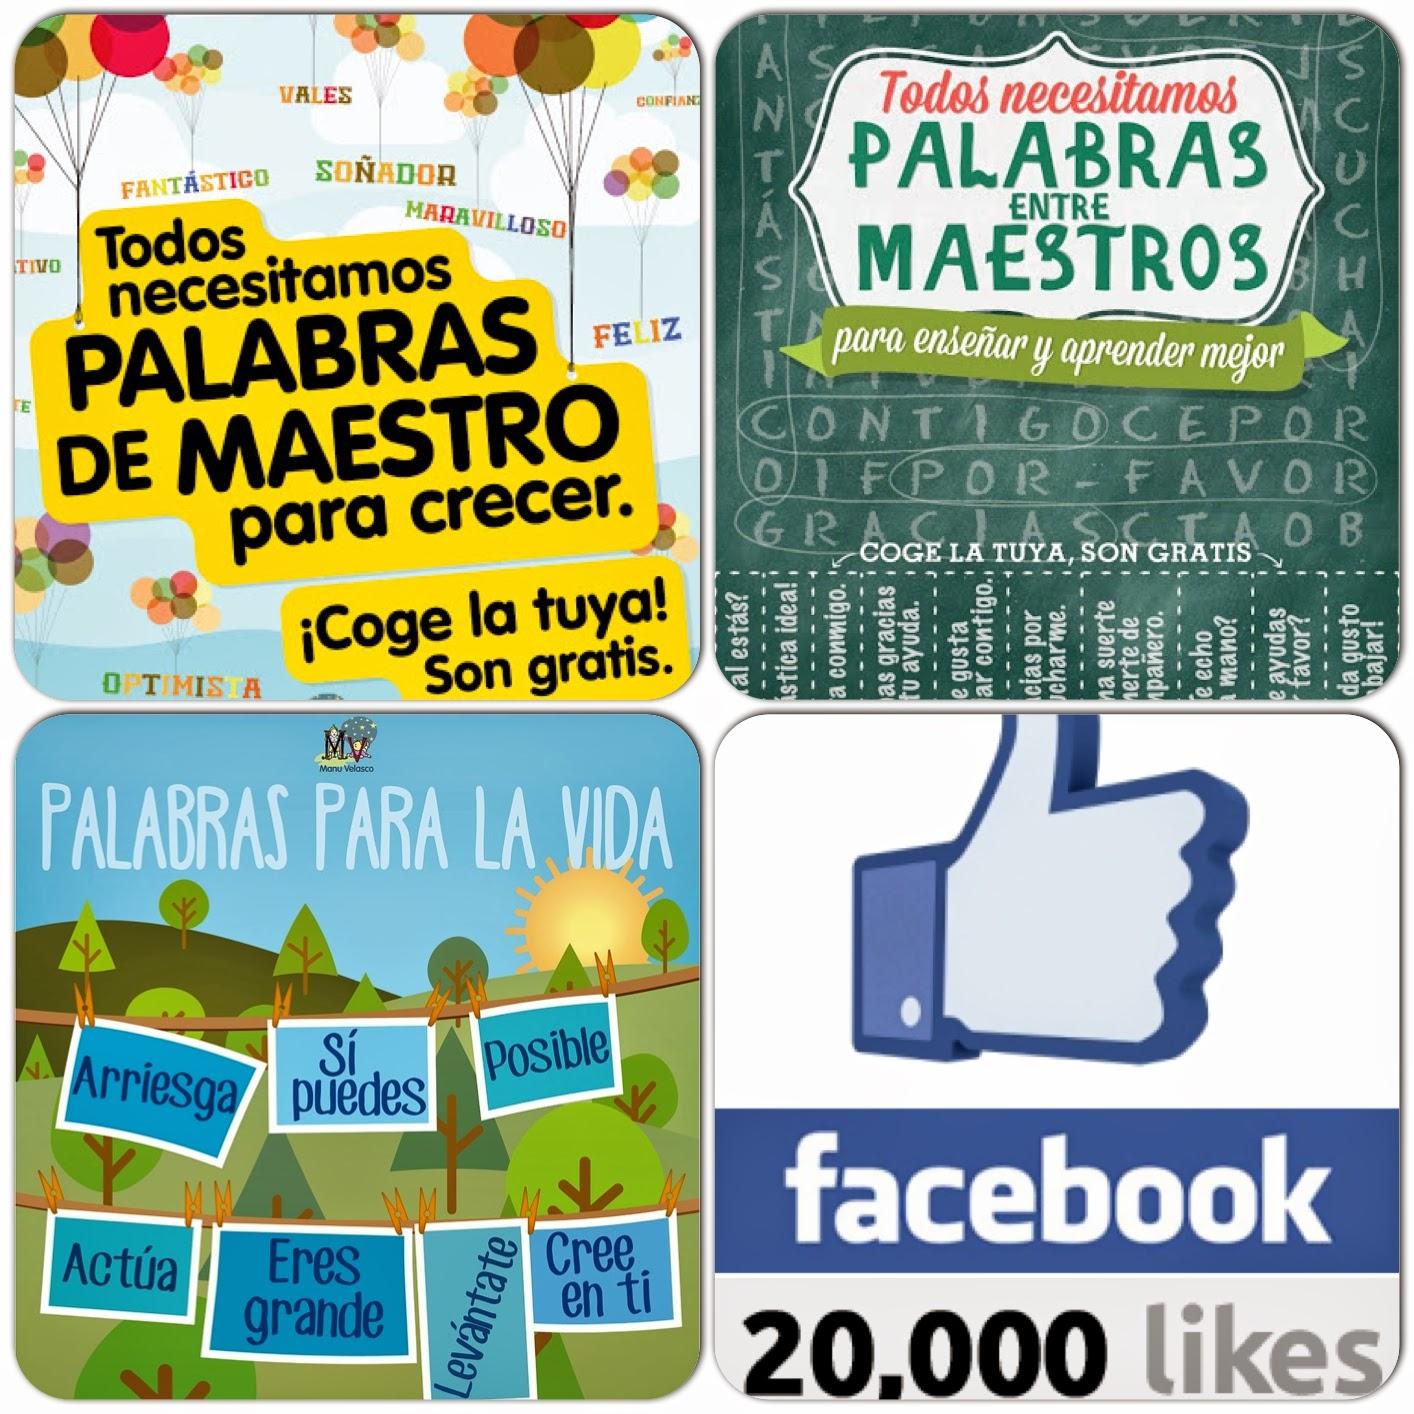 http://elblogdemanuvelasco.blogspot.com.es/search/label/Palabras%20para%20crecer